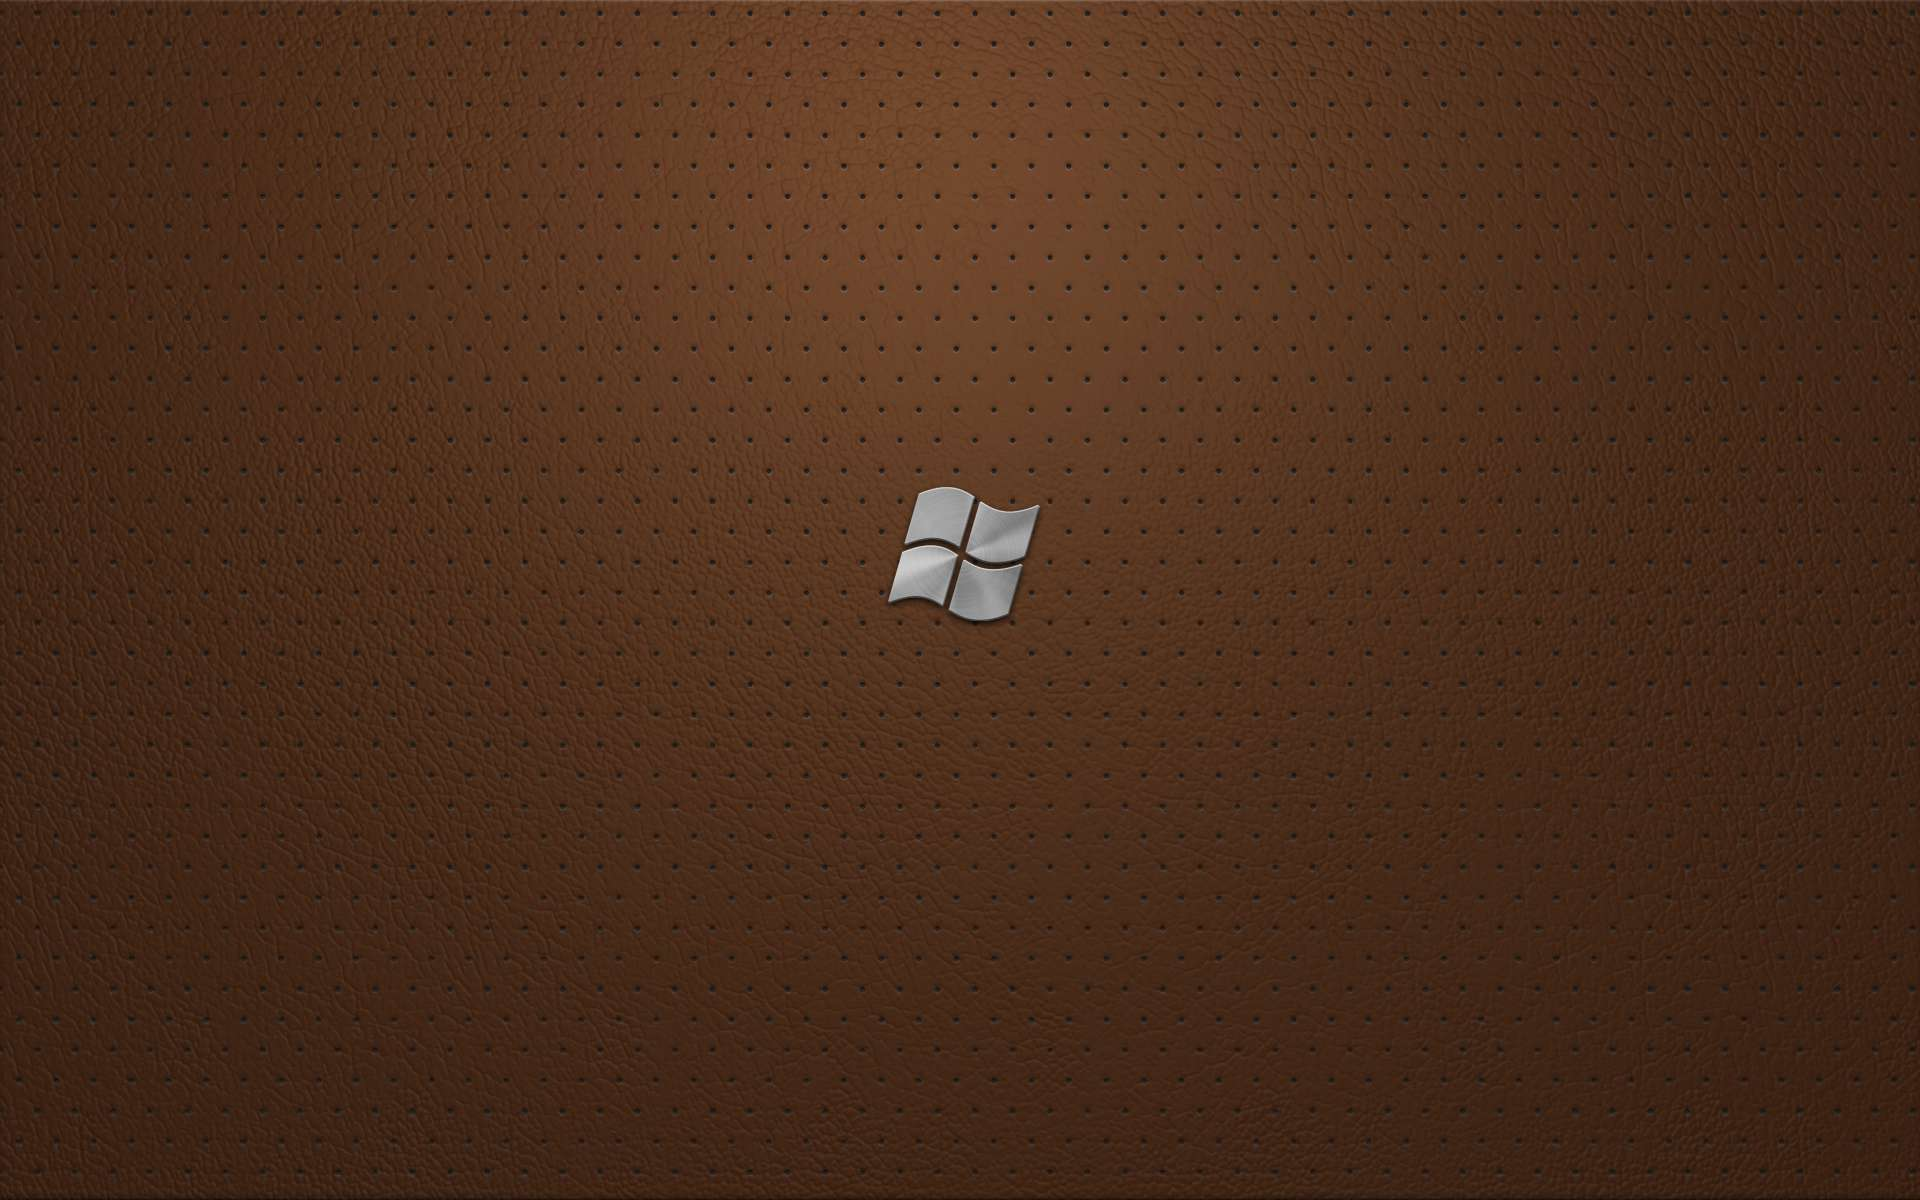 Computer Wallpapers Windows Vista Wallpapers 1920x1200